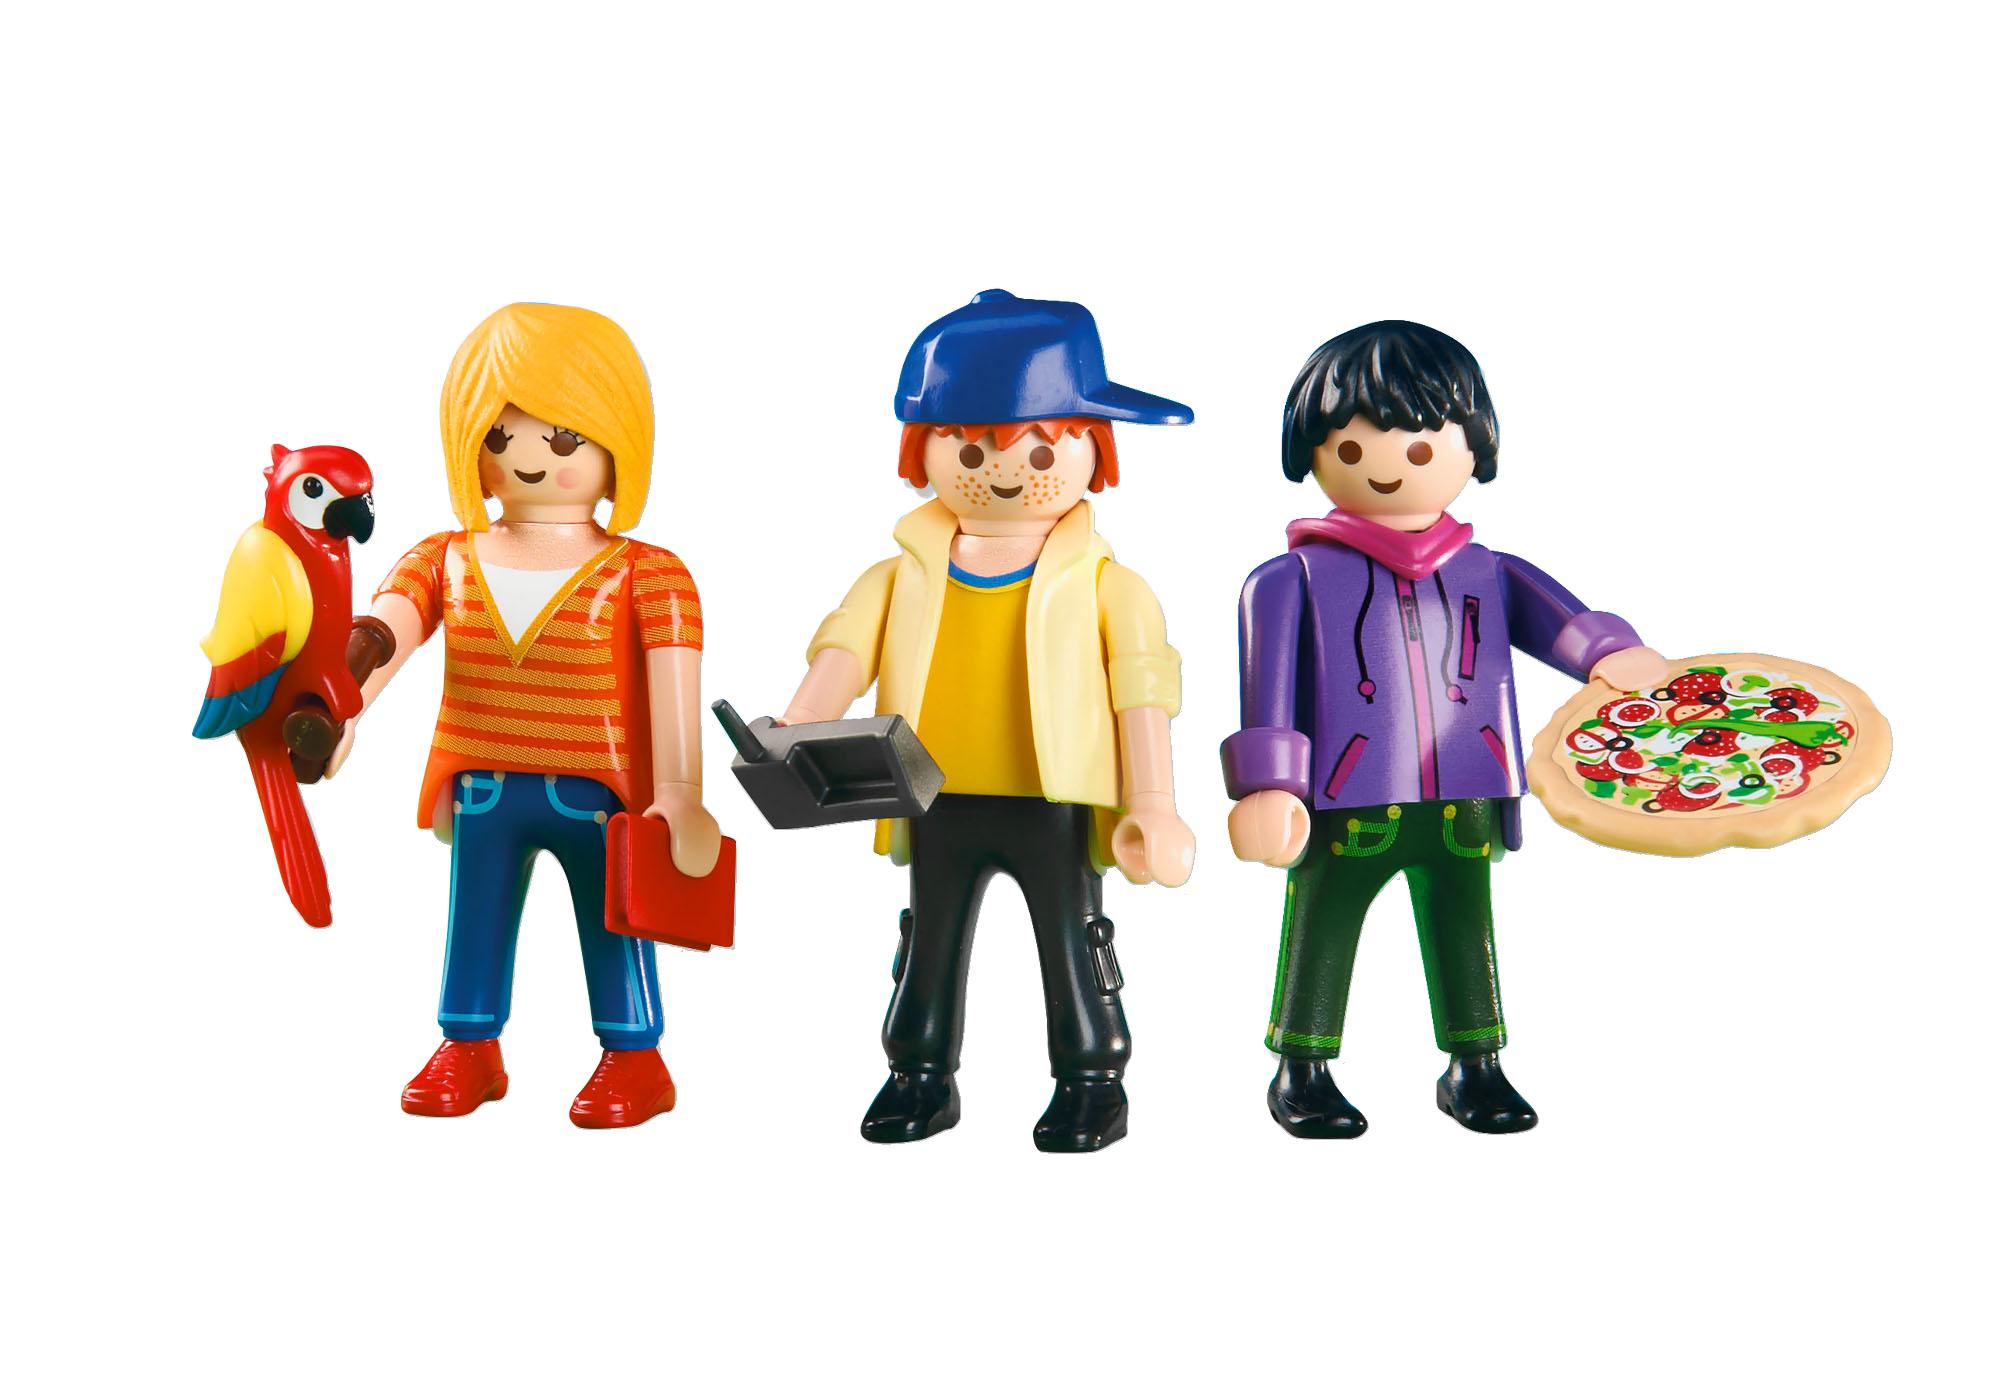 http://media.playmobil.com/i/playmobil/6298_product_detail/Die drei PLAYMOS